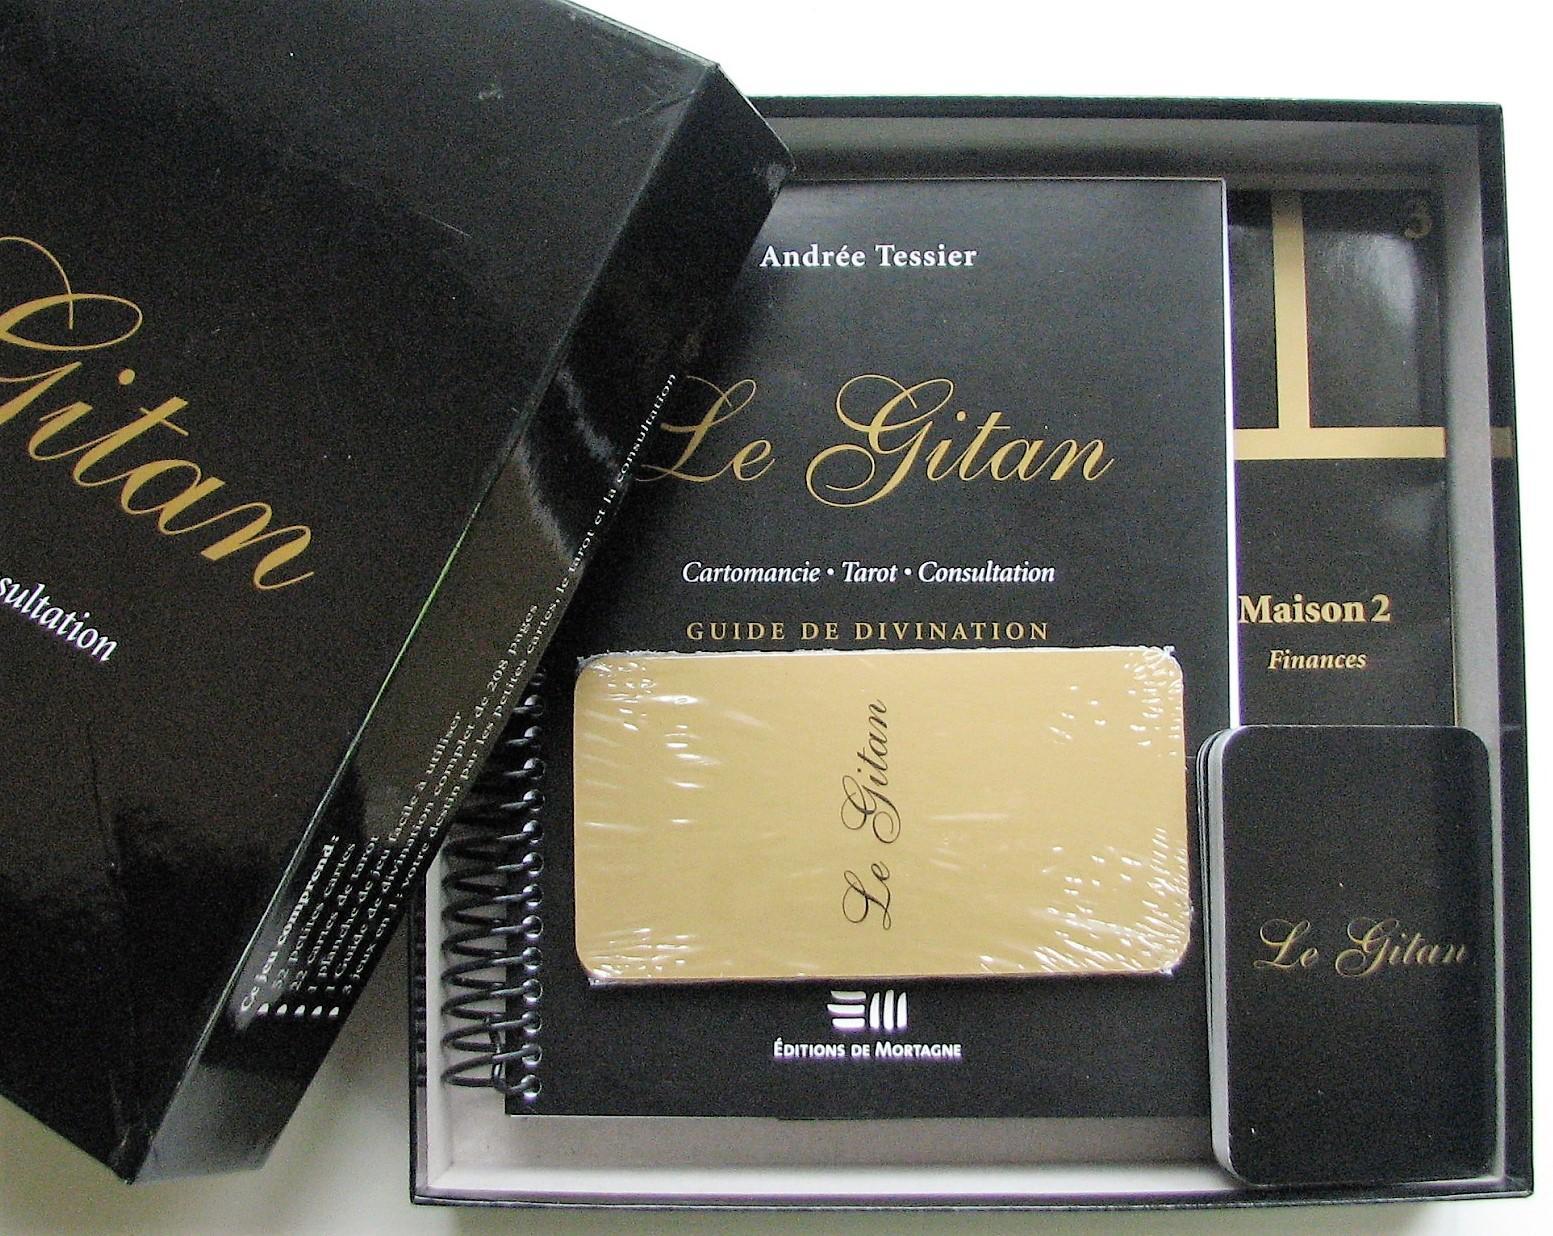 Le Gitan  Cartomancie, Tarot, Consultation (coffret)  Tessier, Andrée 1dbd6930c785